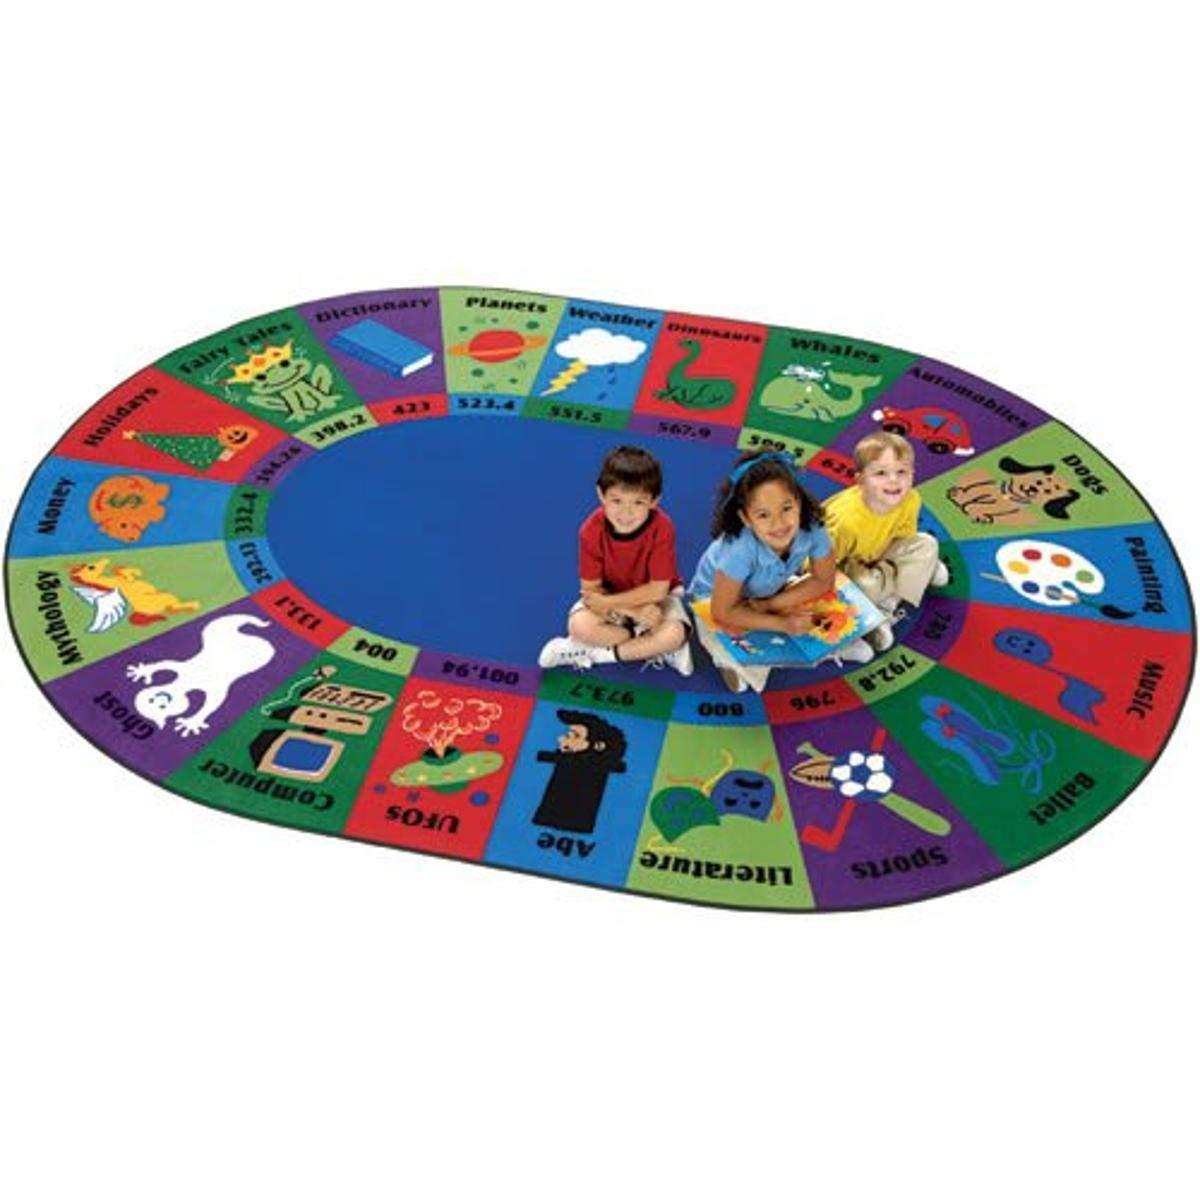 Carpets NEW before selling for Kids 5795 Circletime Fun Dewey Decimal Rug SALENEW very popular